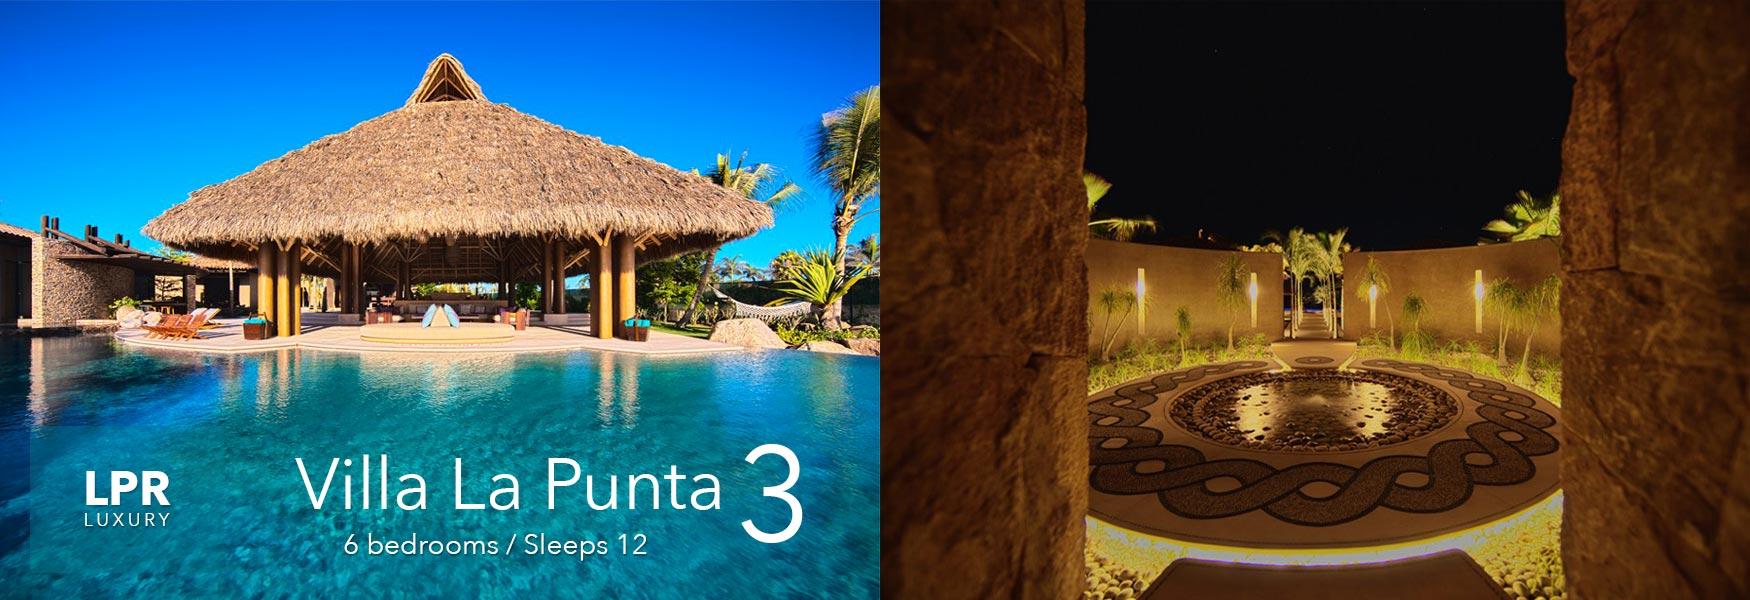 Villa La Punta 3 - Punta Mita Resort - Riviera Nayarit, Mexico